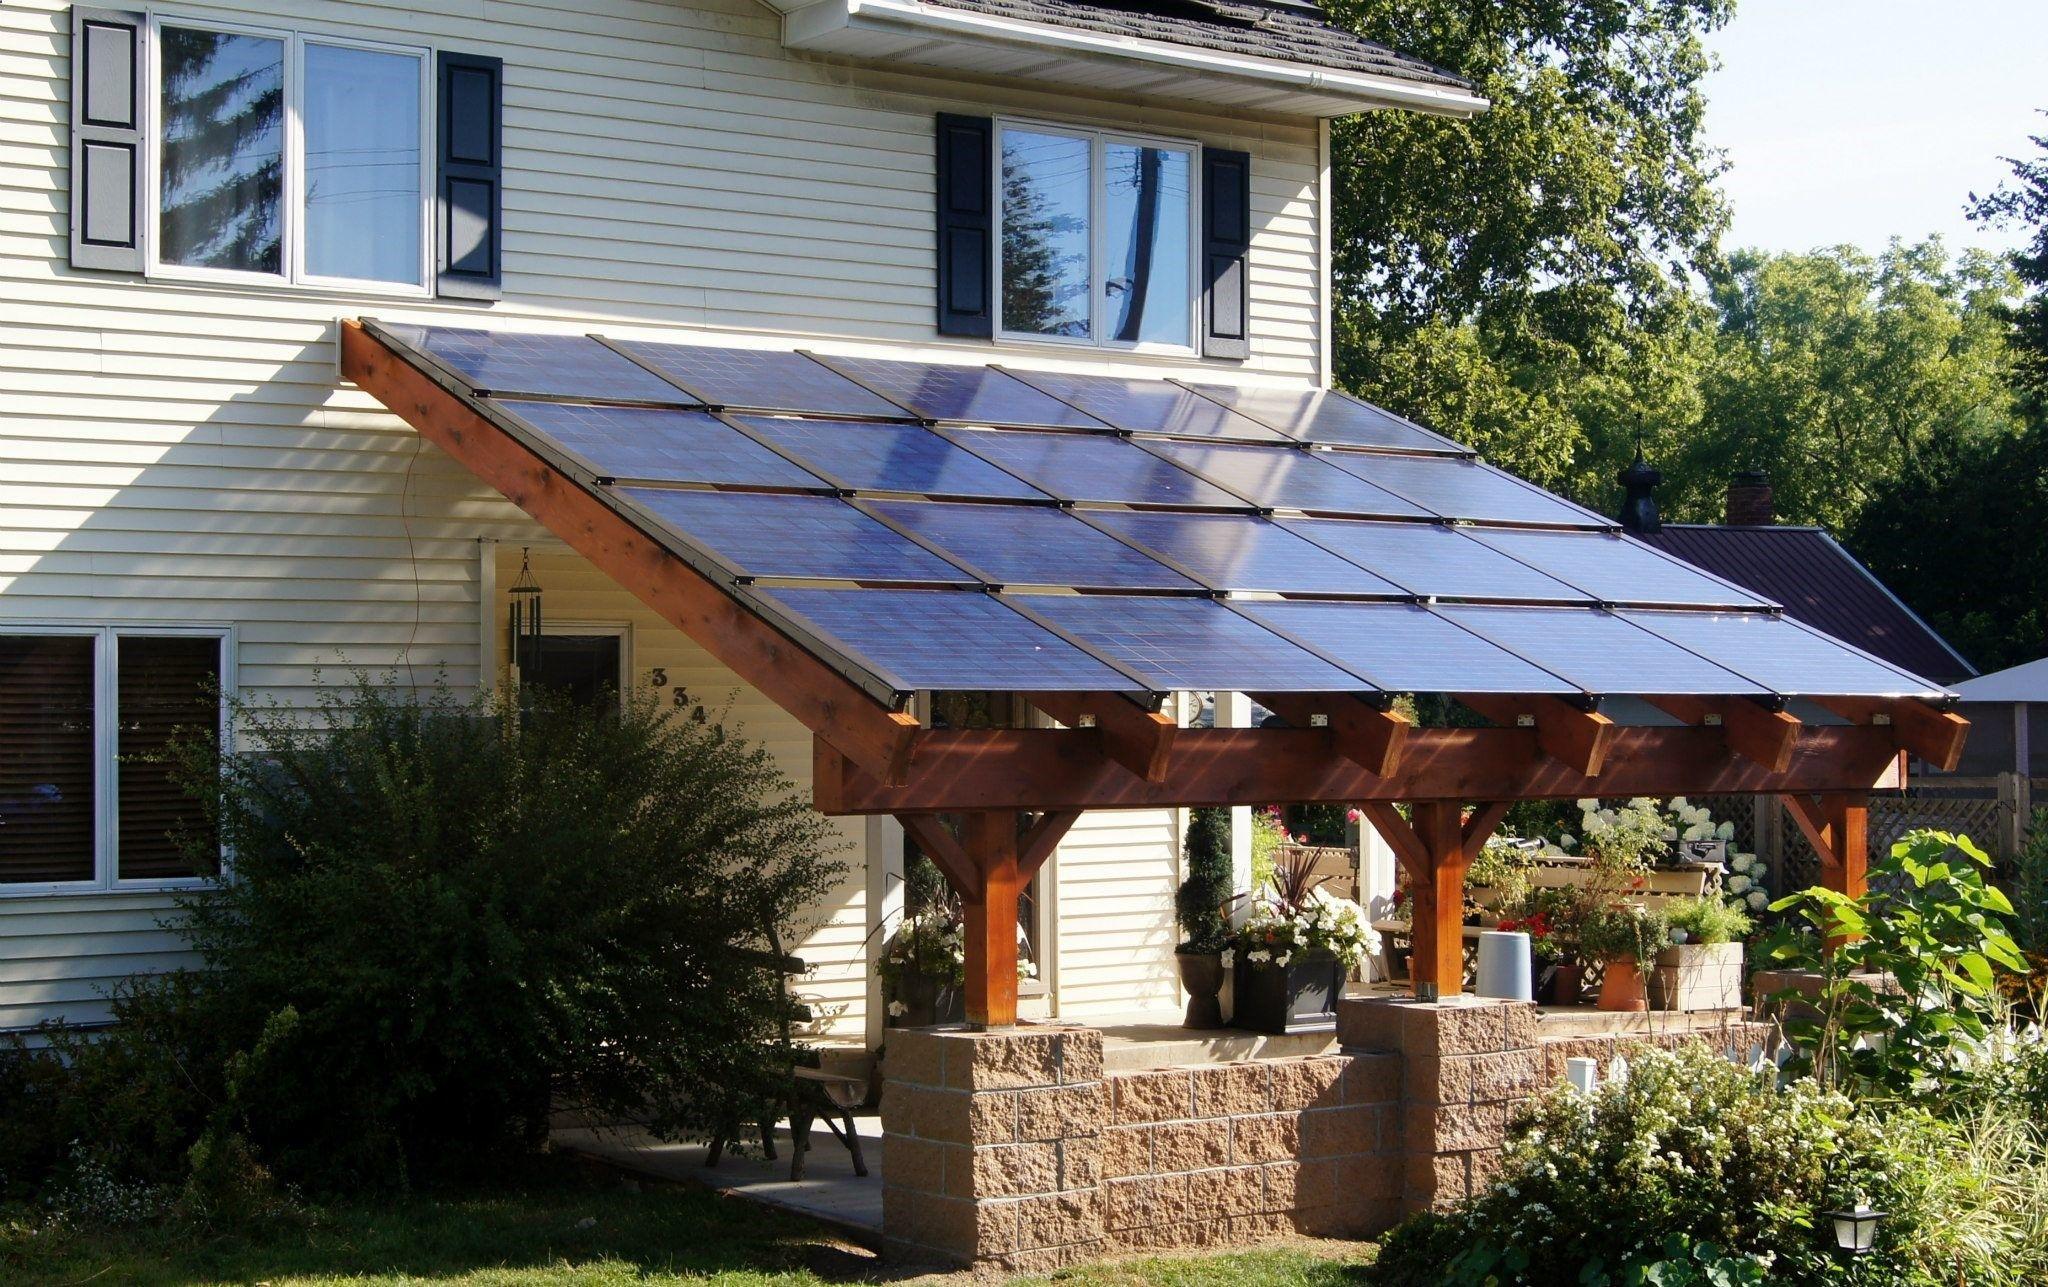 Blue Horizon Energy Solar Carport 3 8kw Of Silicon Energy Cascade Pv Modules In 2020 Solar Patio Solar Panels Solar Panels For Home